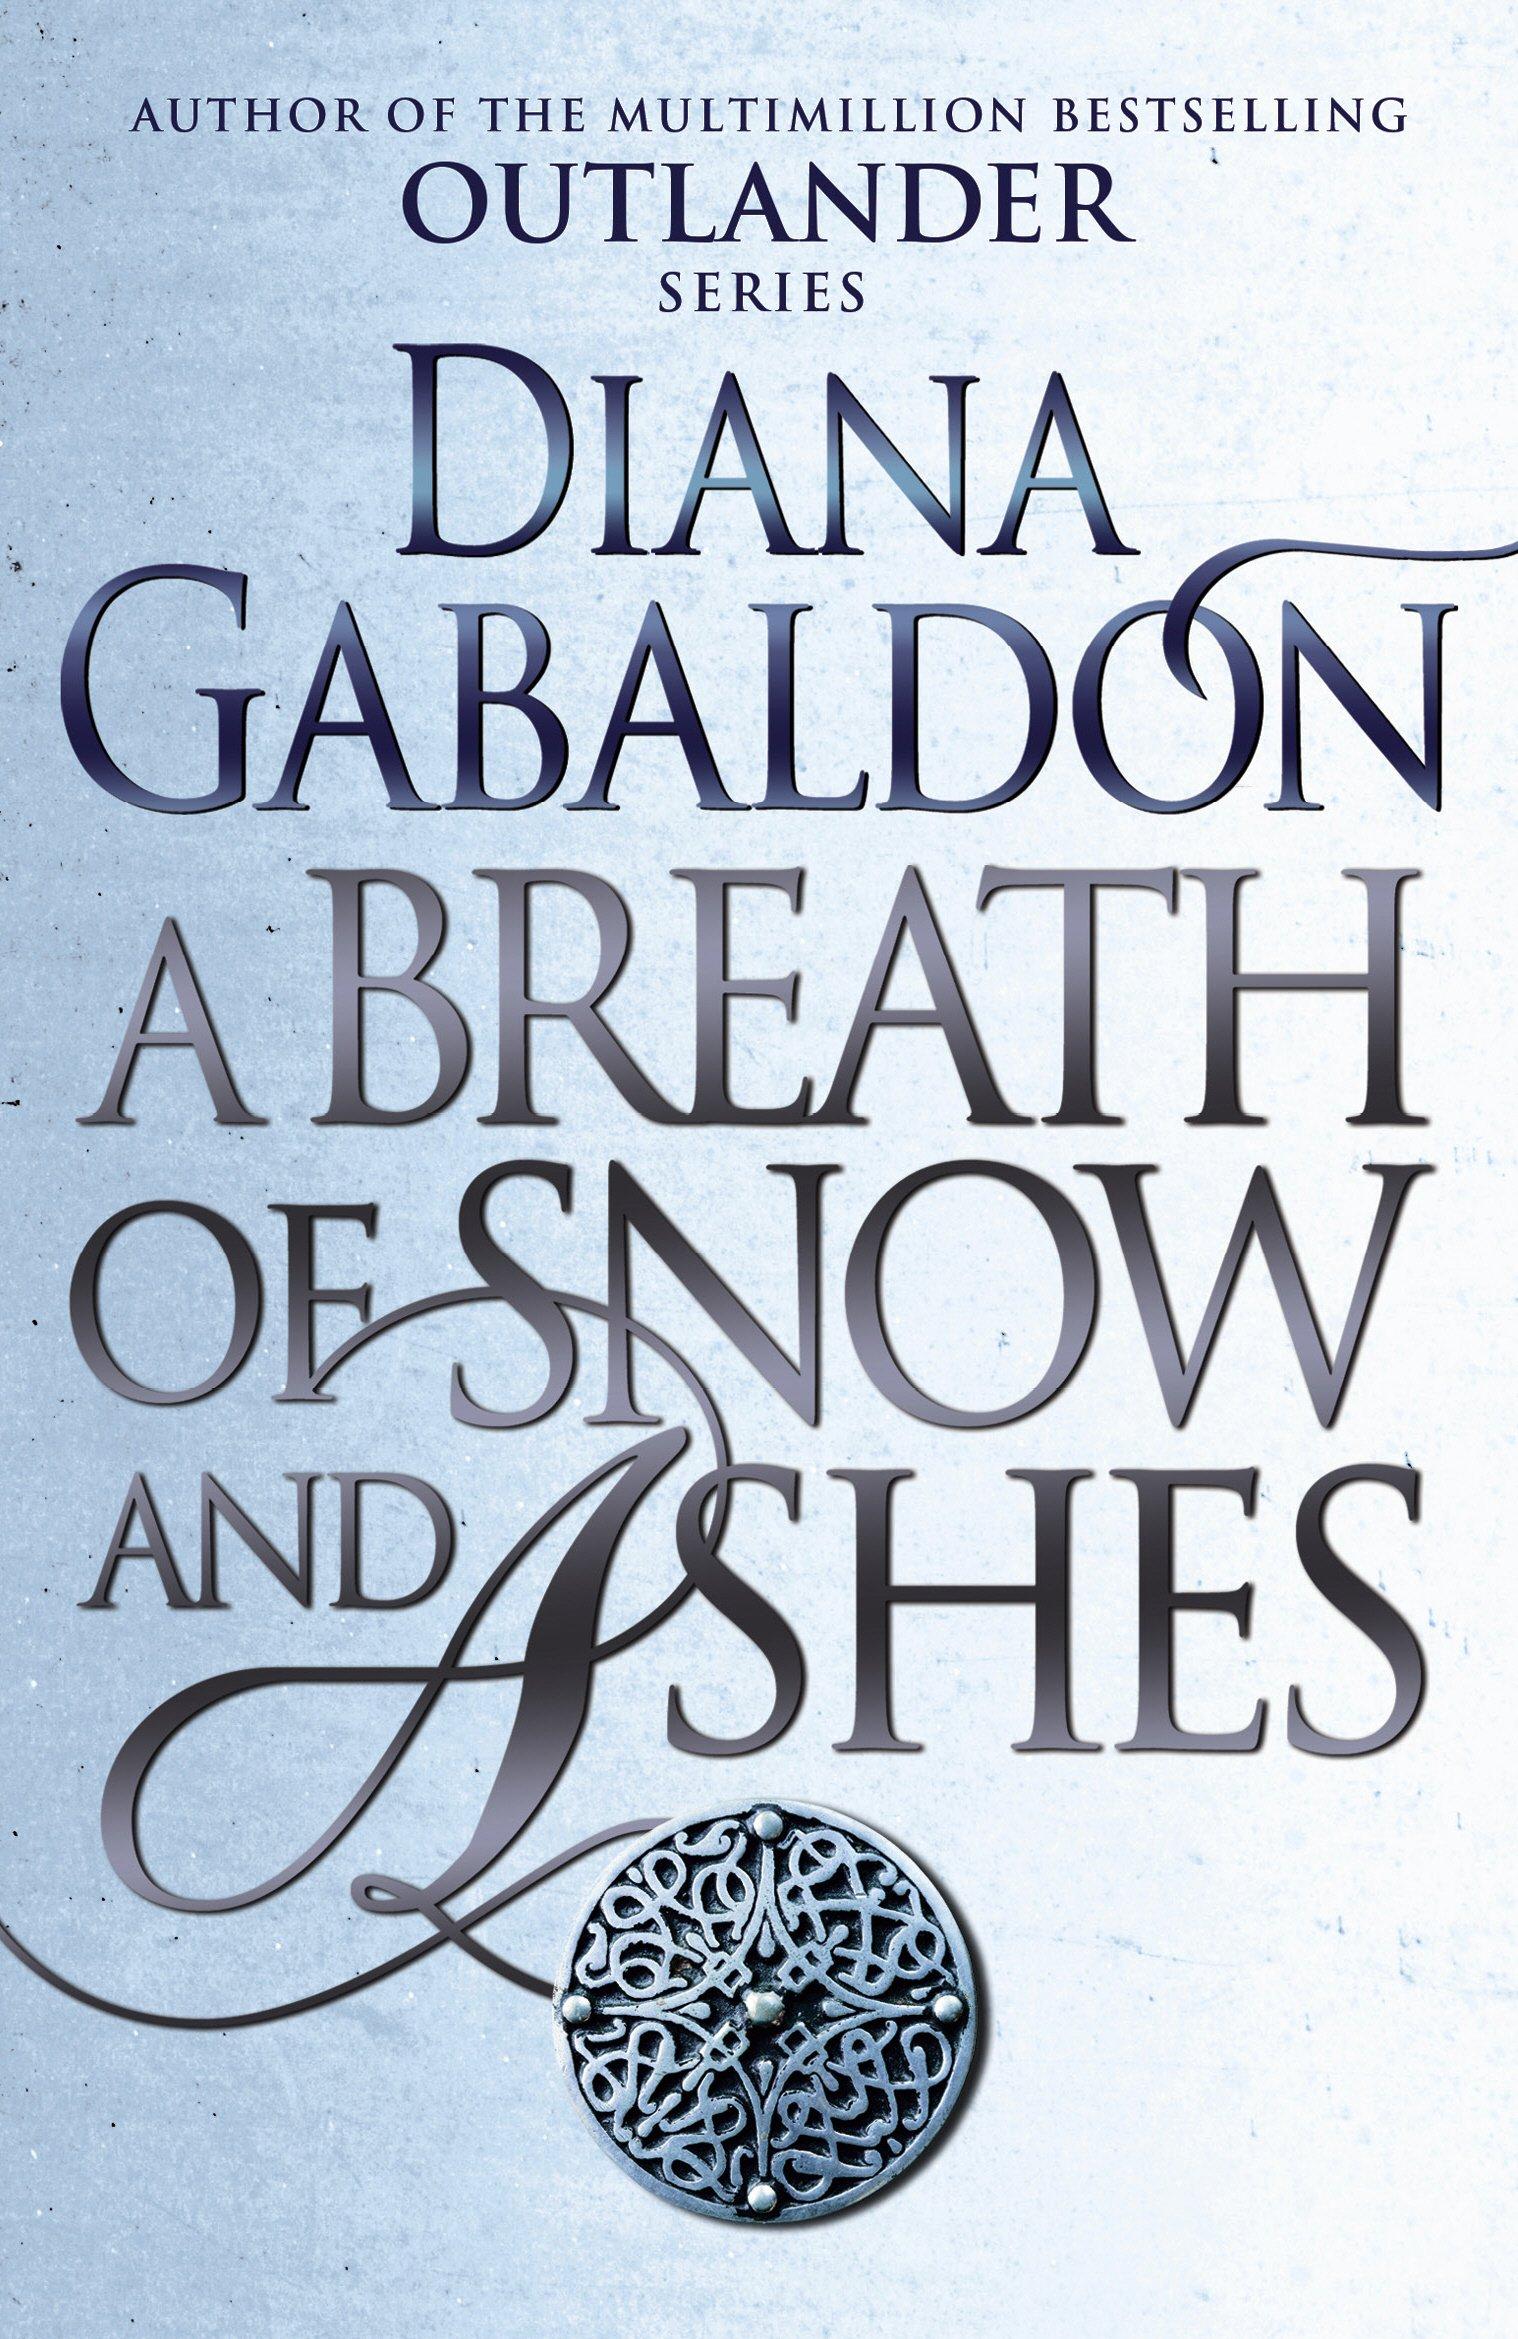 A Breath Of Snow And Ashes: (Outlander 6): Amazon.de: Diana Gabaldon:  Fremdsprachige Bücher